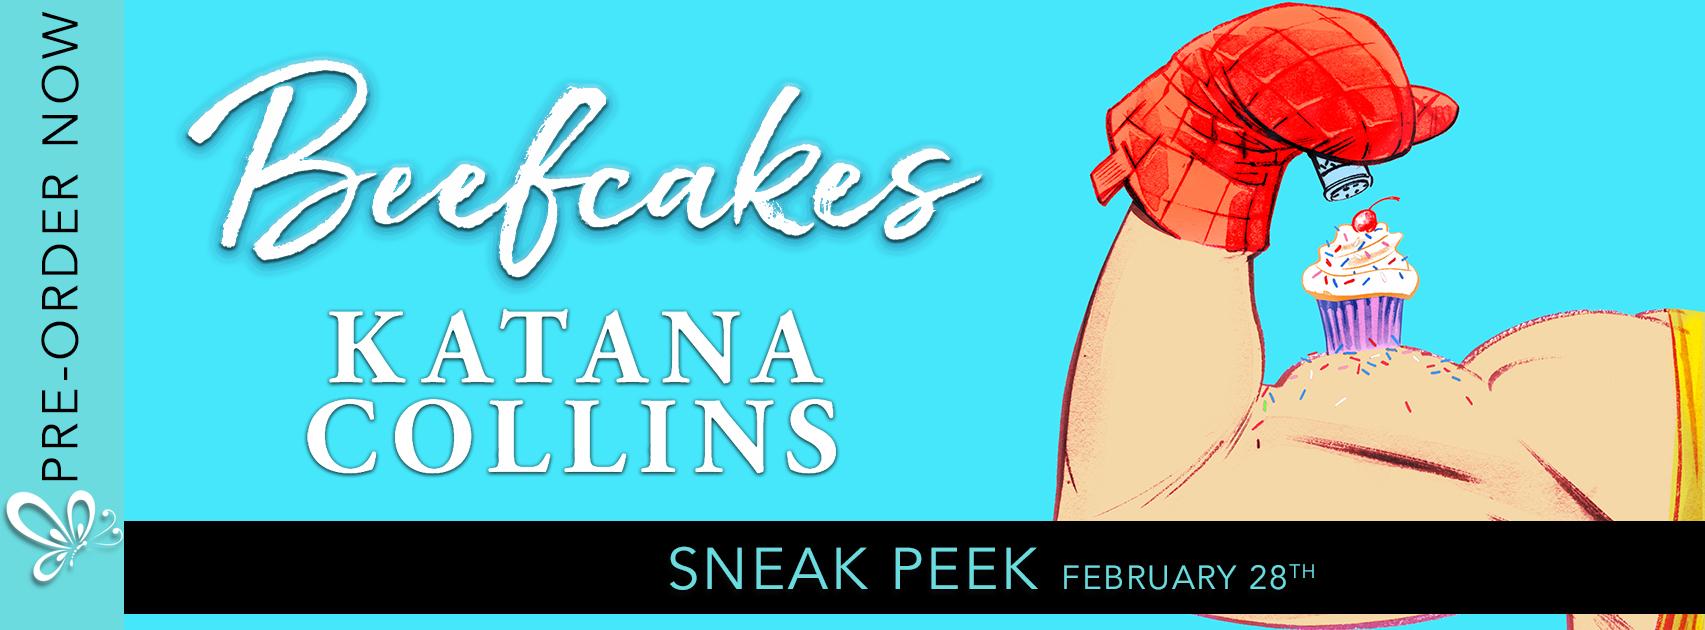 Beefcakes - SP banner